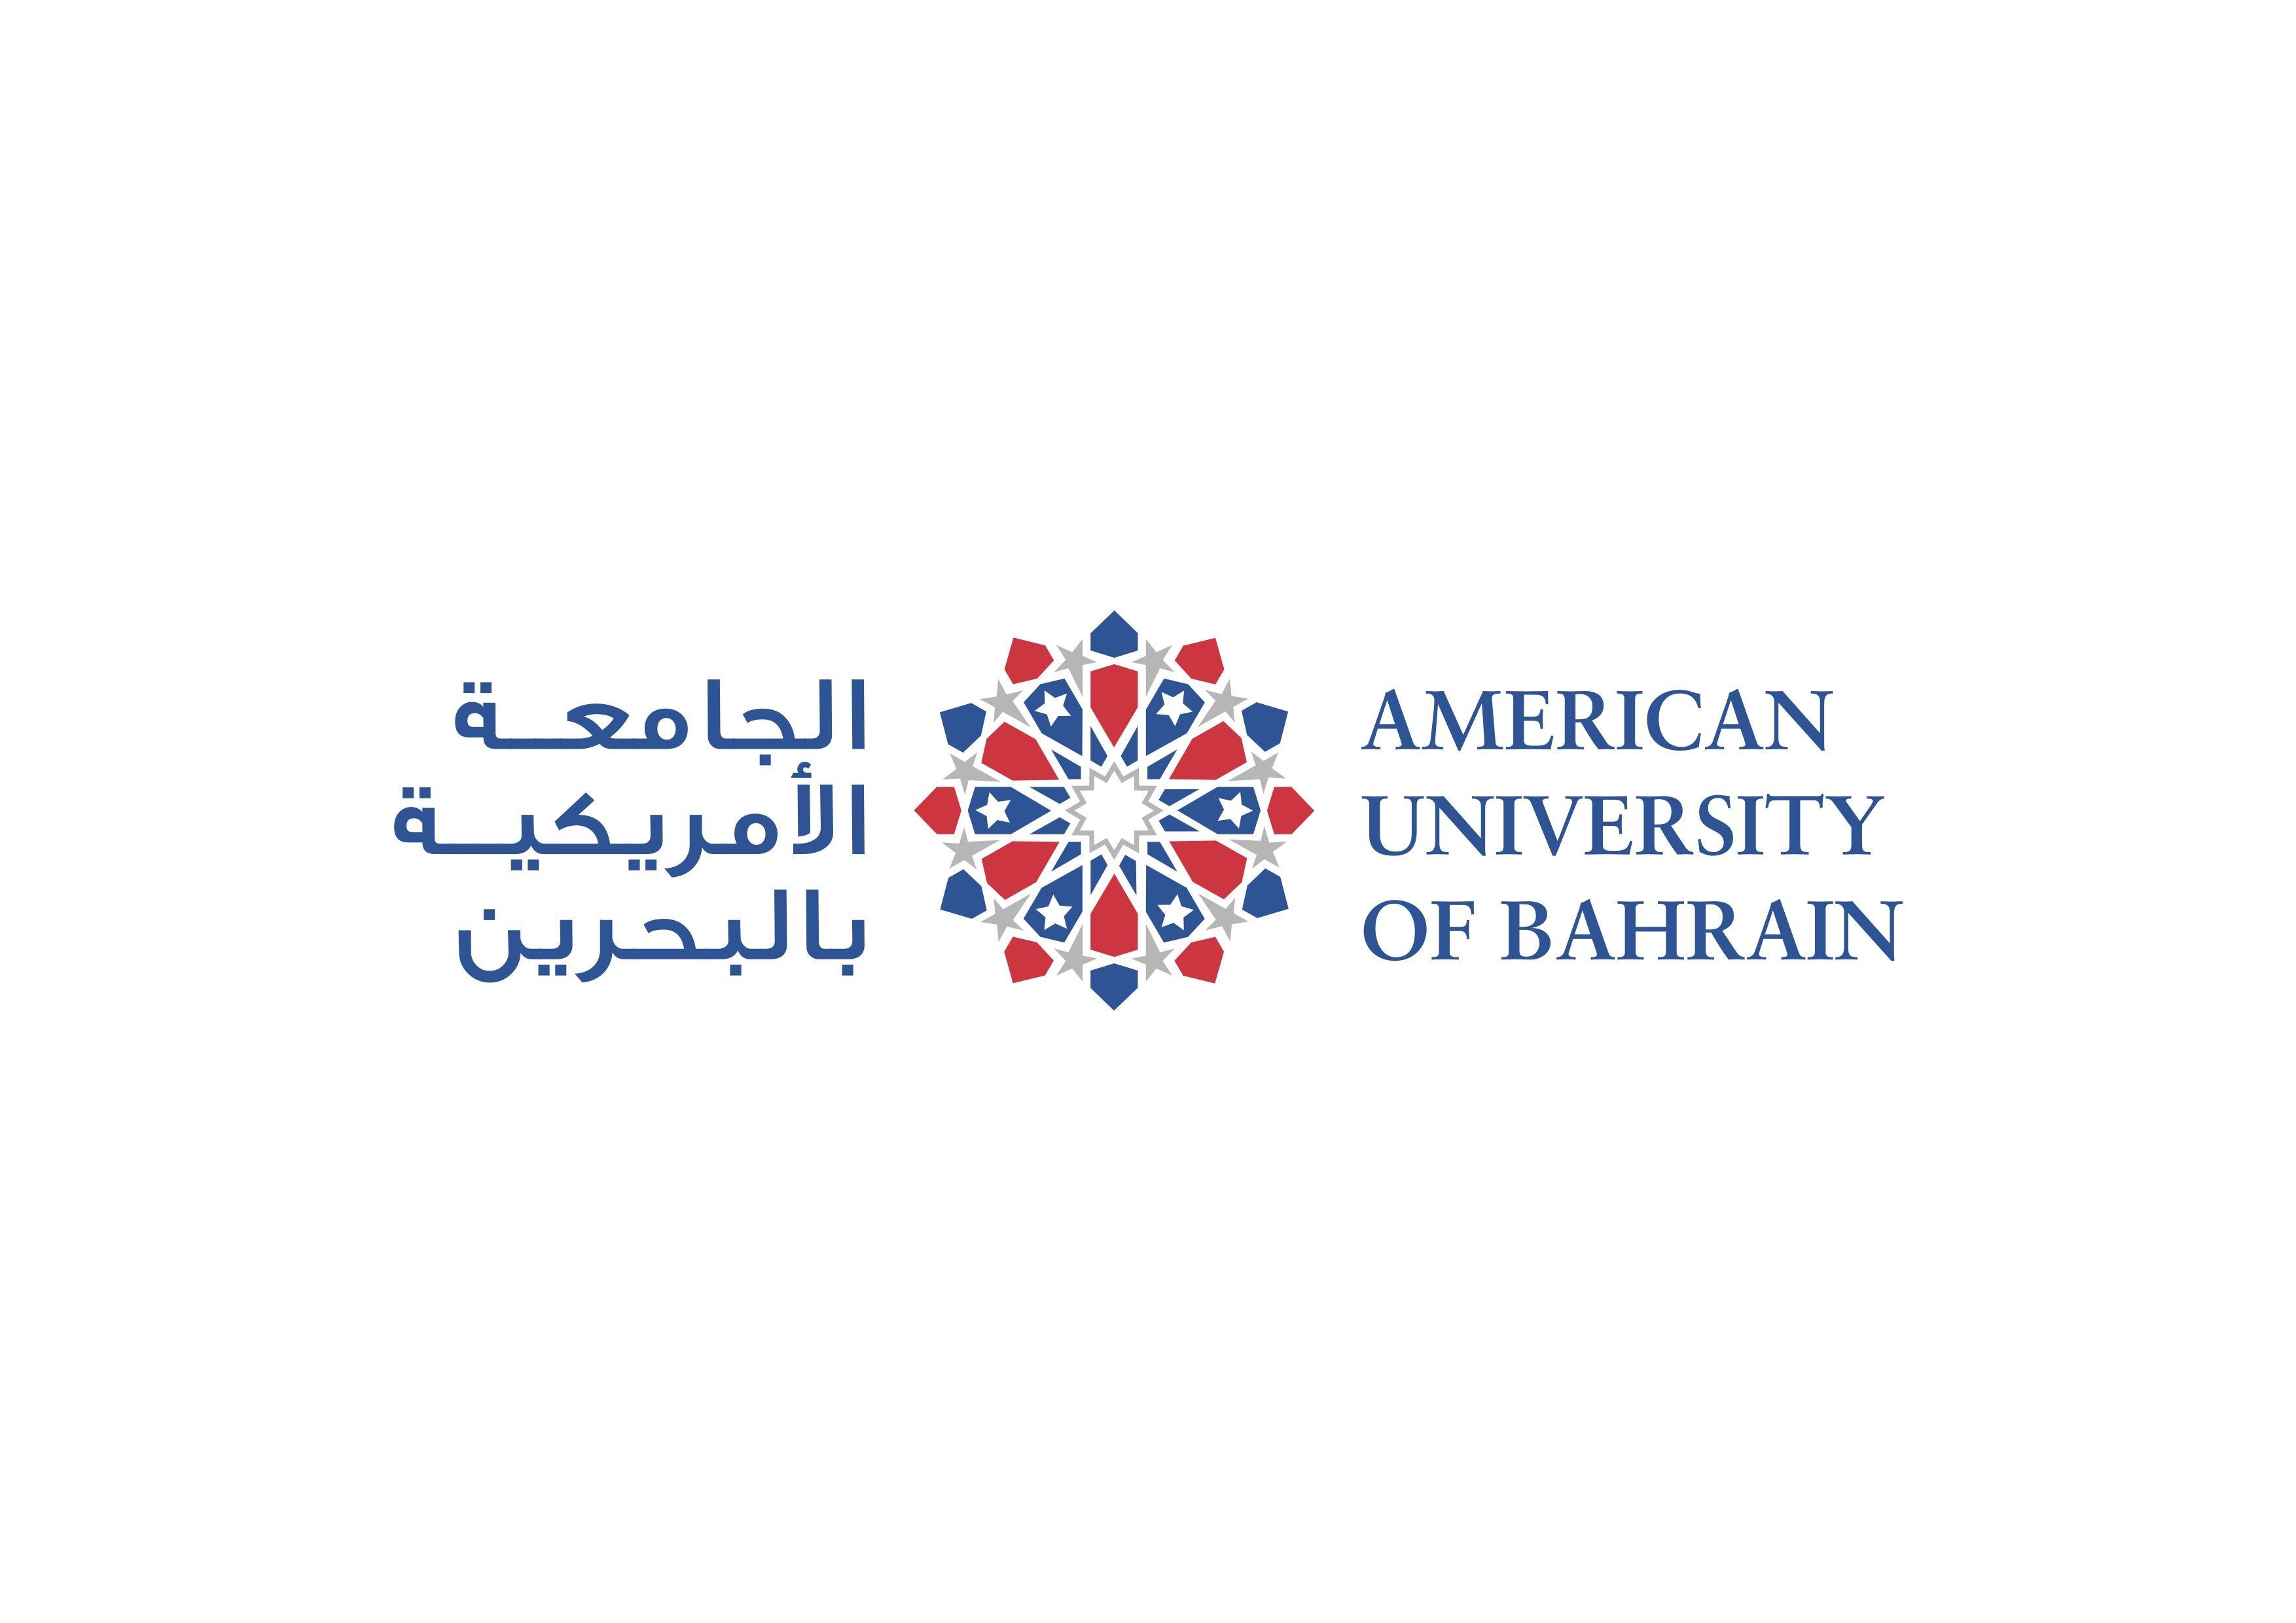 bahrain-university-31515246